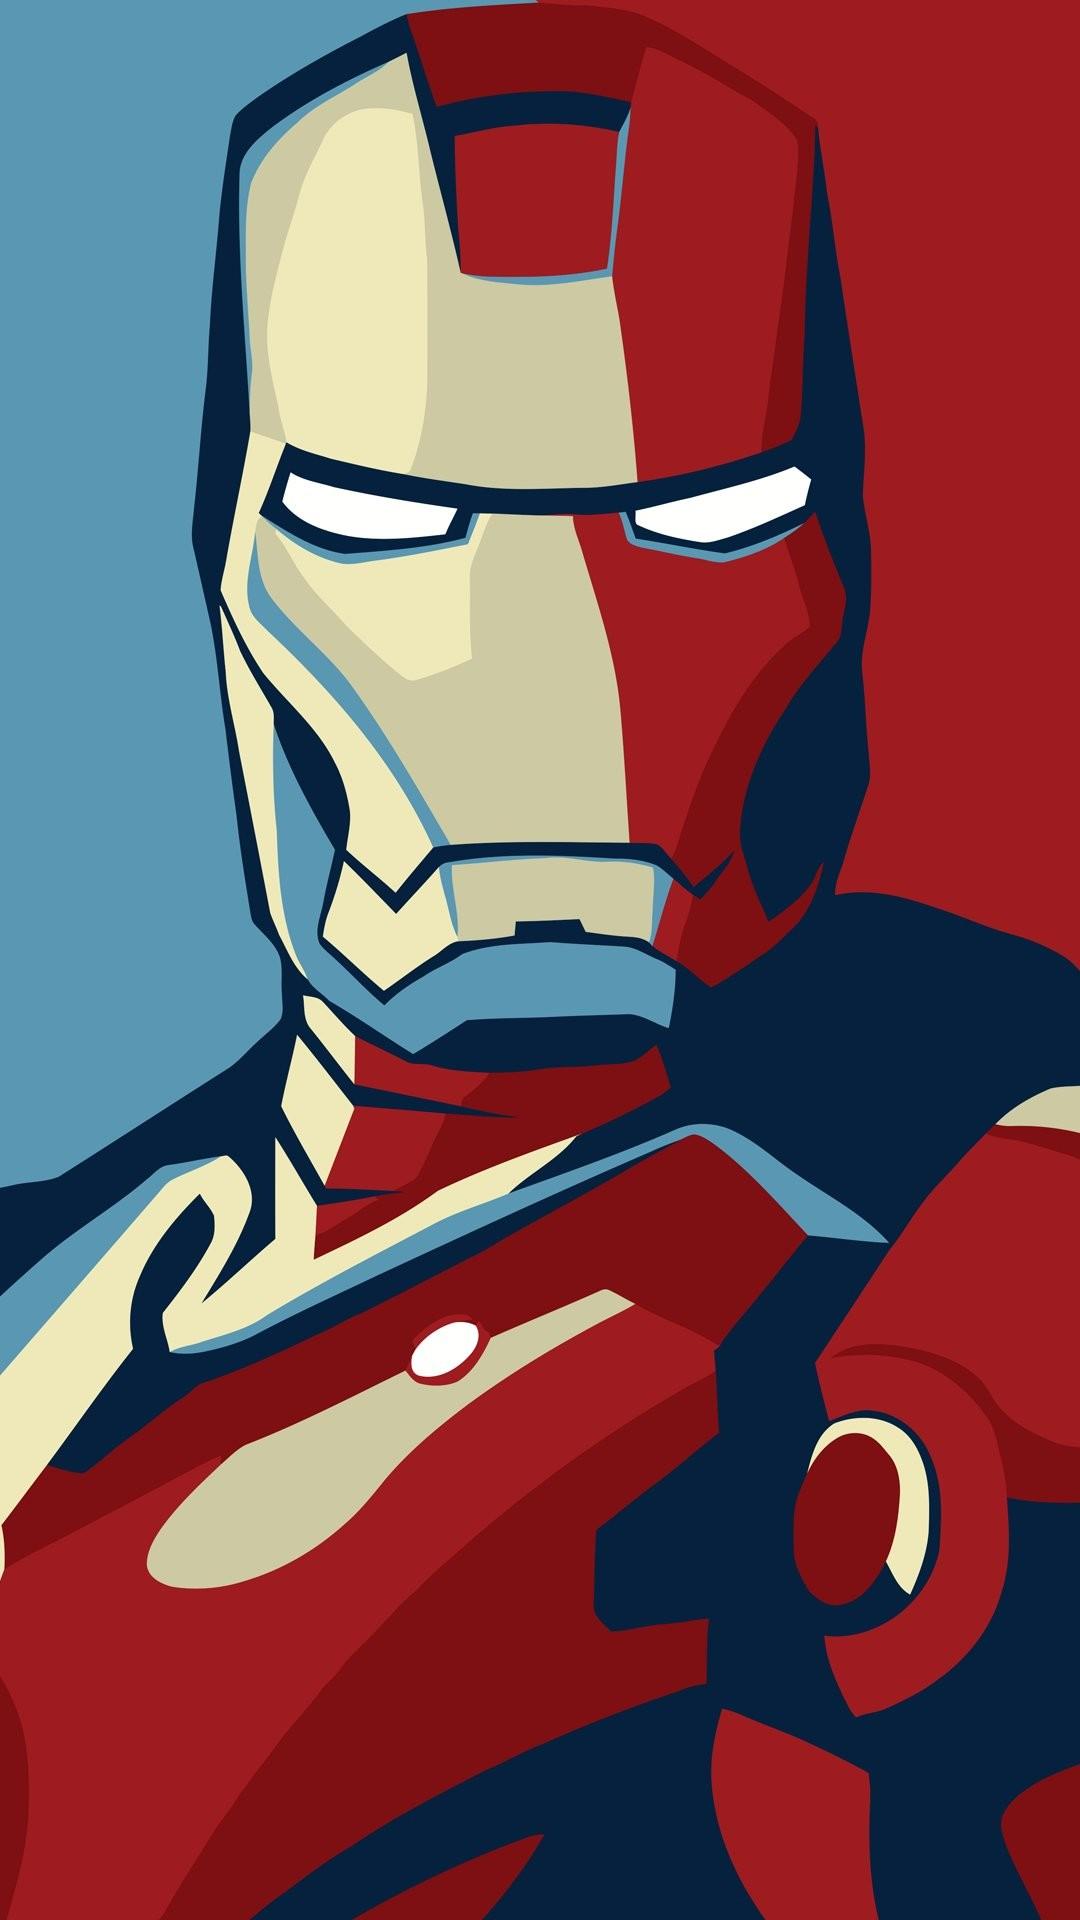 Iron Man Iphone Wallpaper #ironmaniphonewallpaper